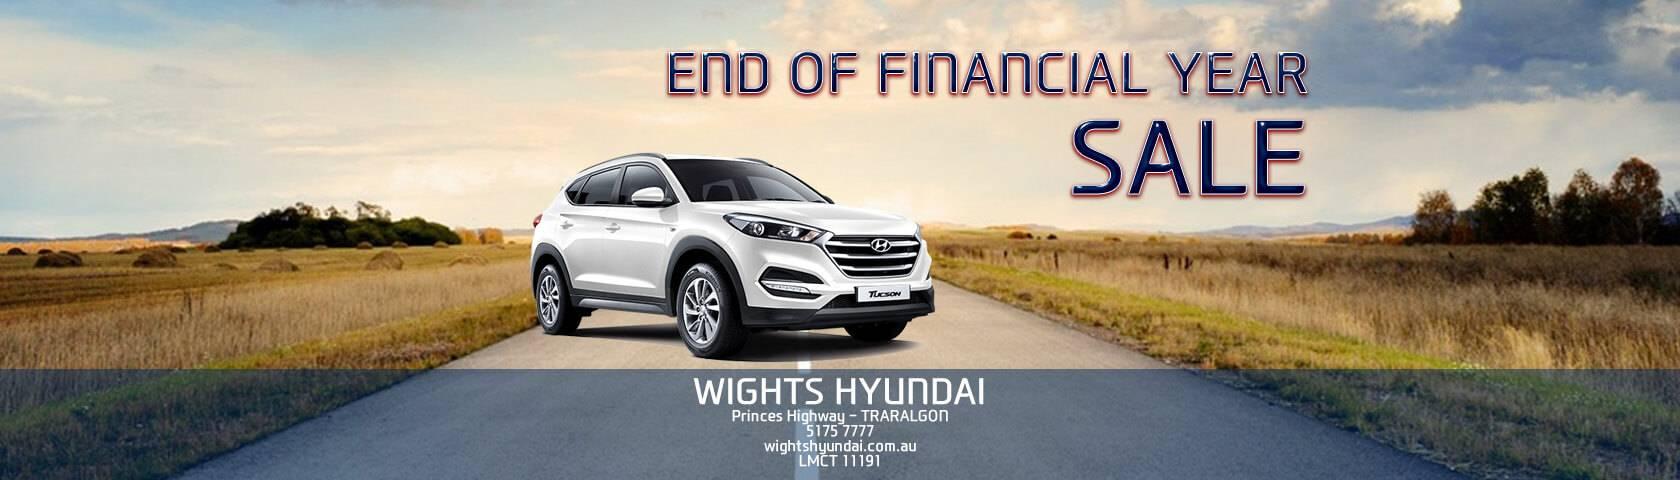 Wights Hyundai EOFY